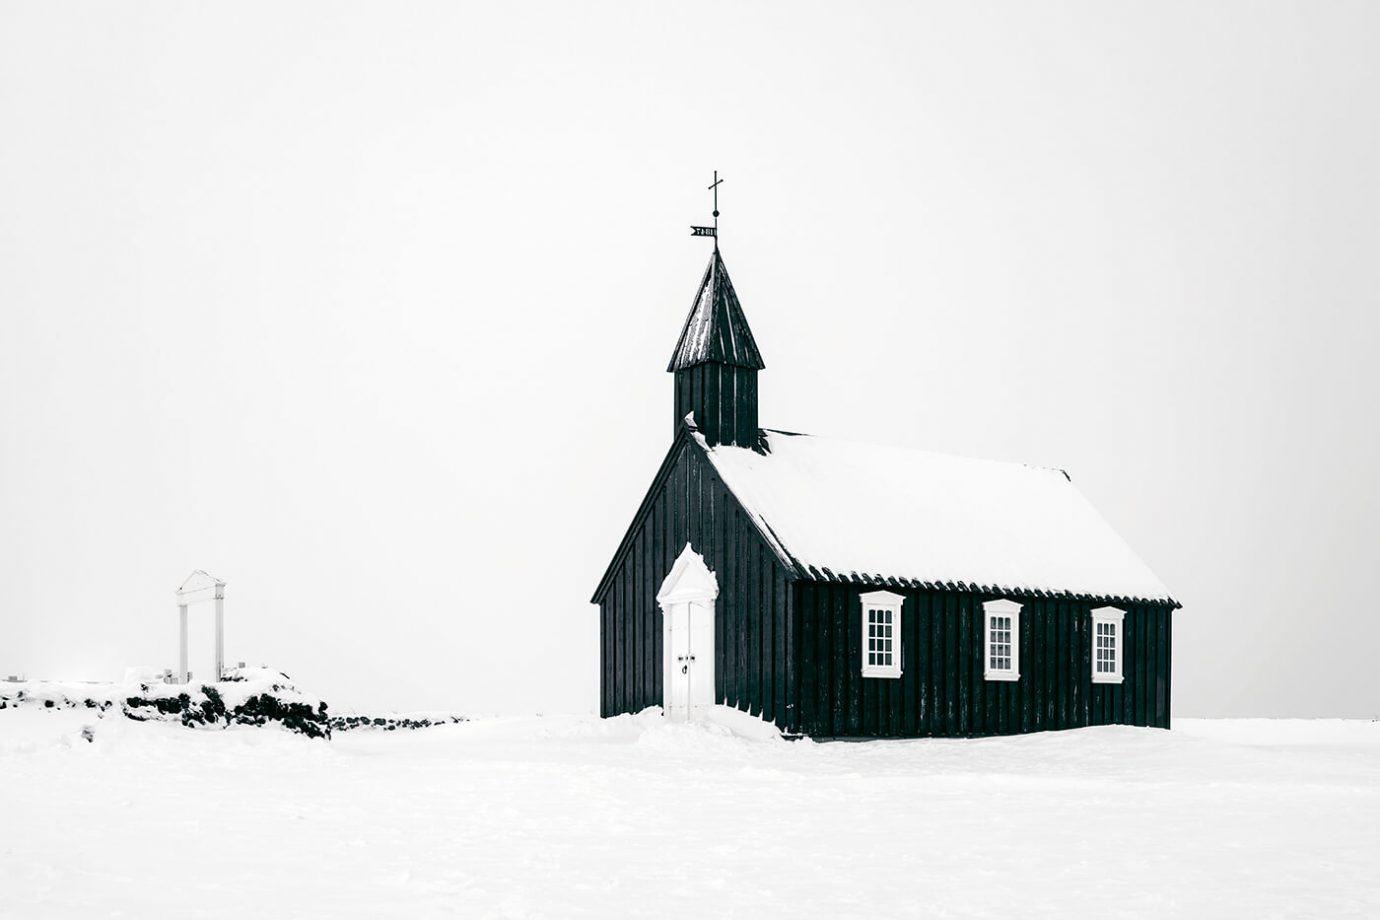 Budir Church, Snaefellsnes Peninsula, Iceland, Melvin Nicholson Photography